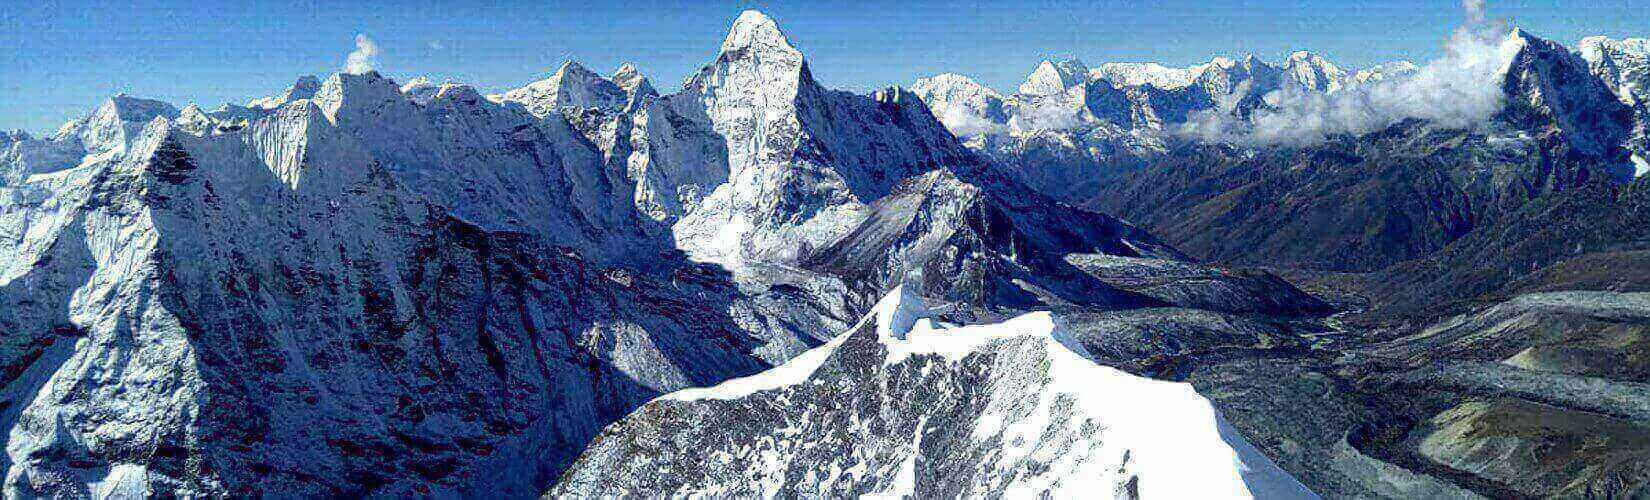 Everest Three Passes Trek | Reasonable Treks And Tour